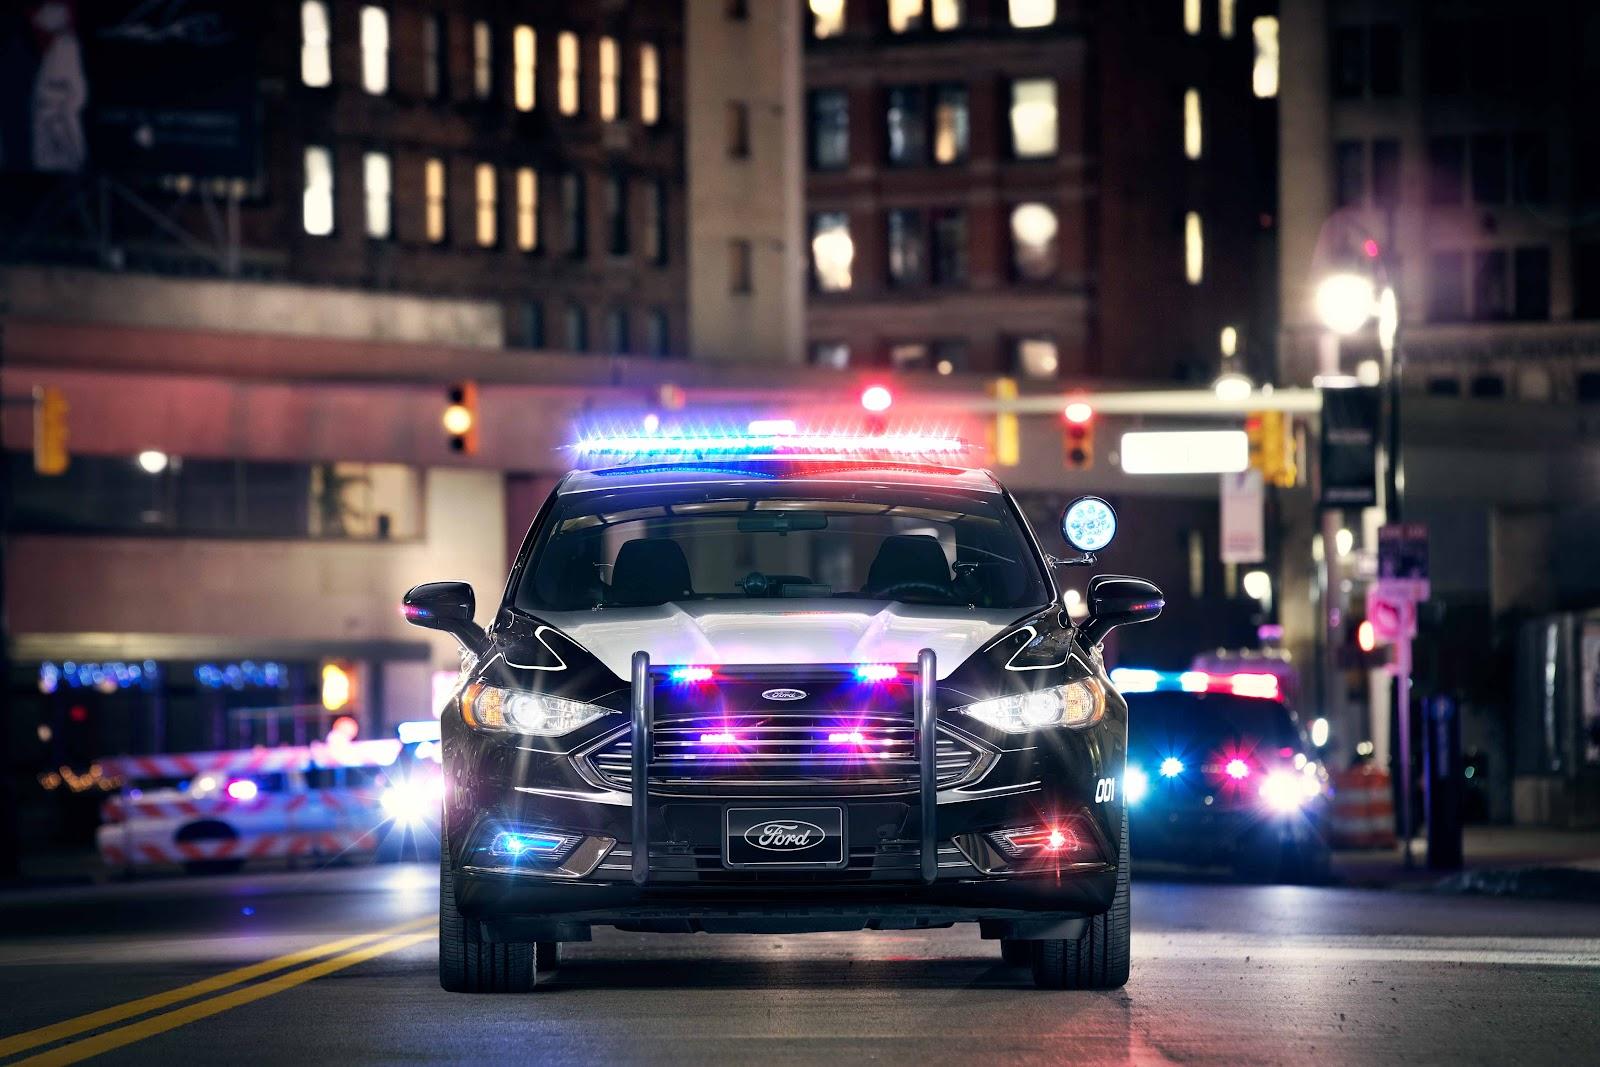 Police Hybrid Patrol Car